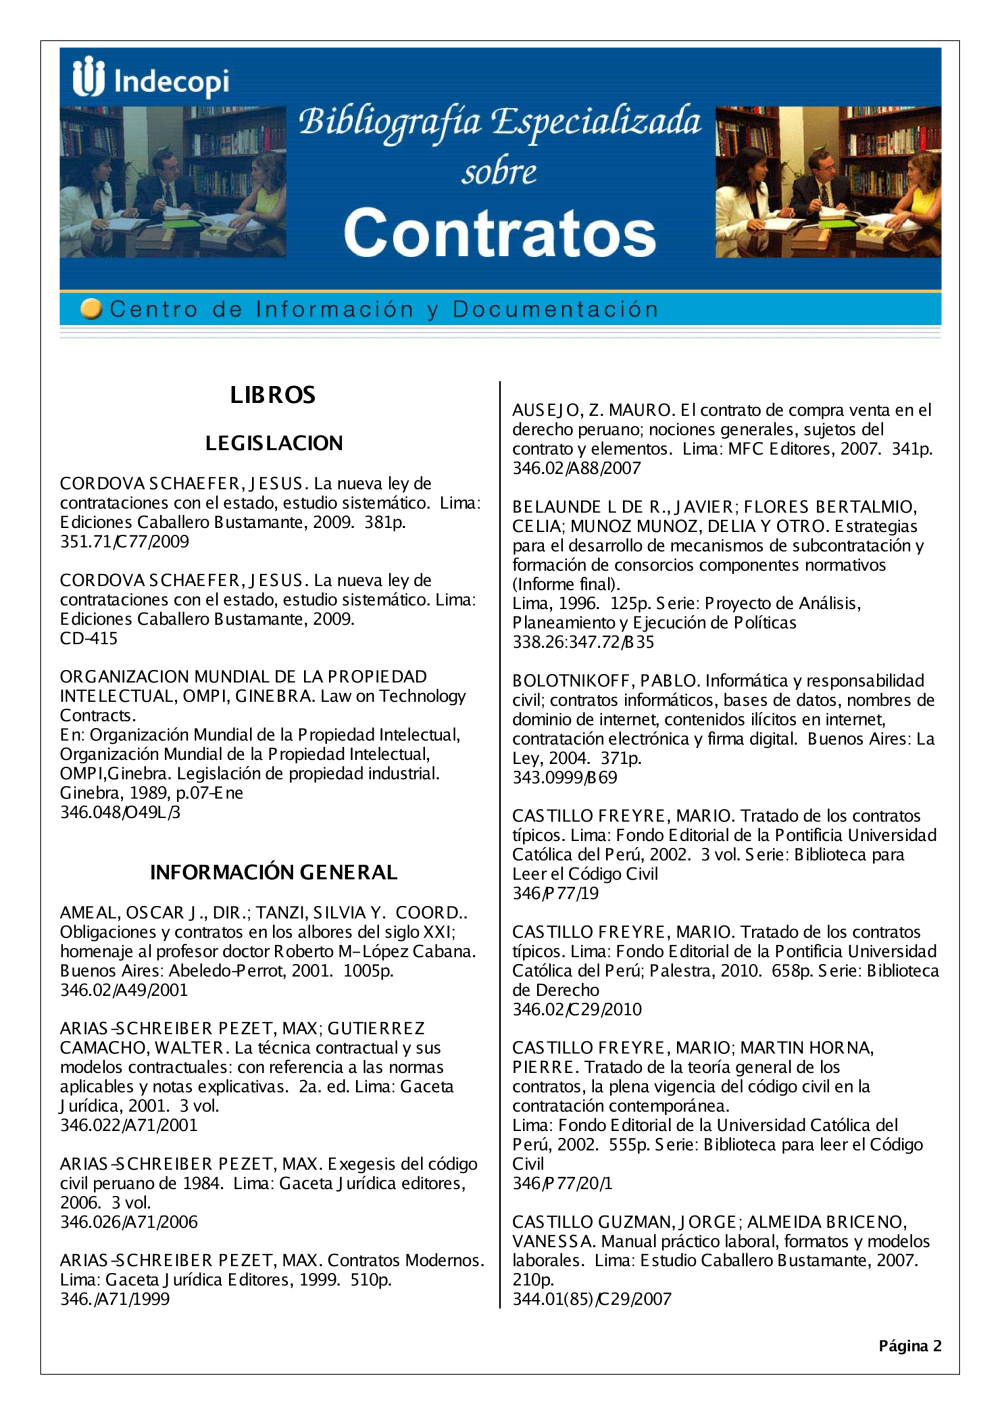 contrato pdf - Inicio - Indecopi